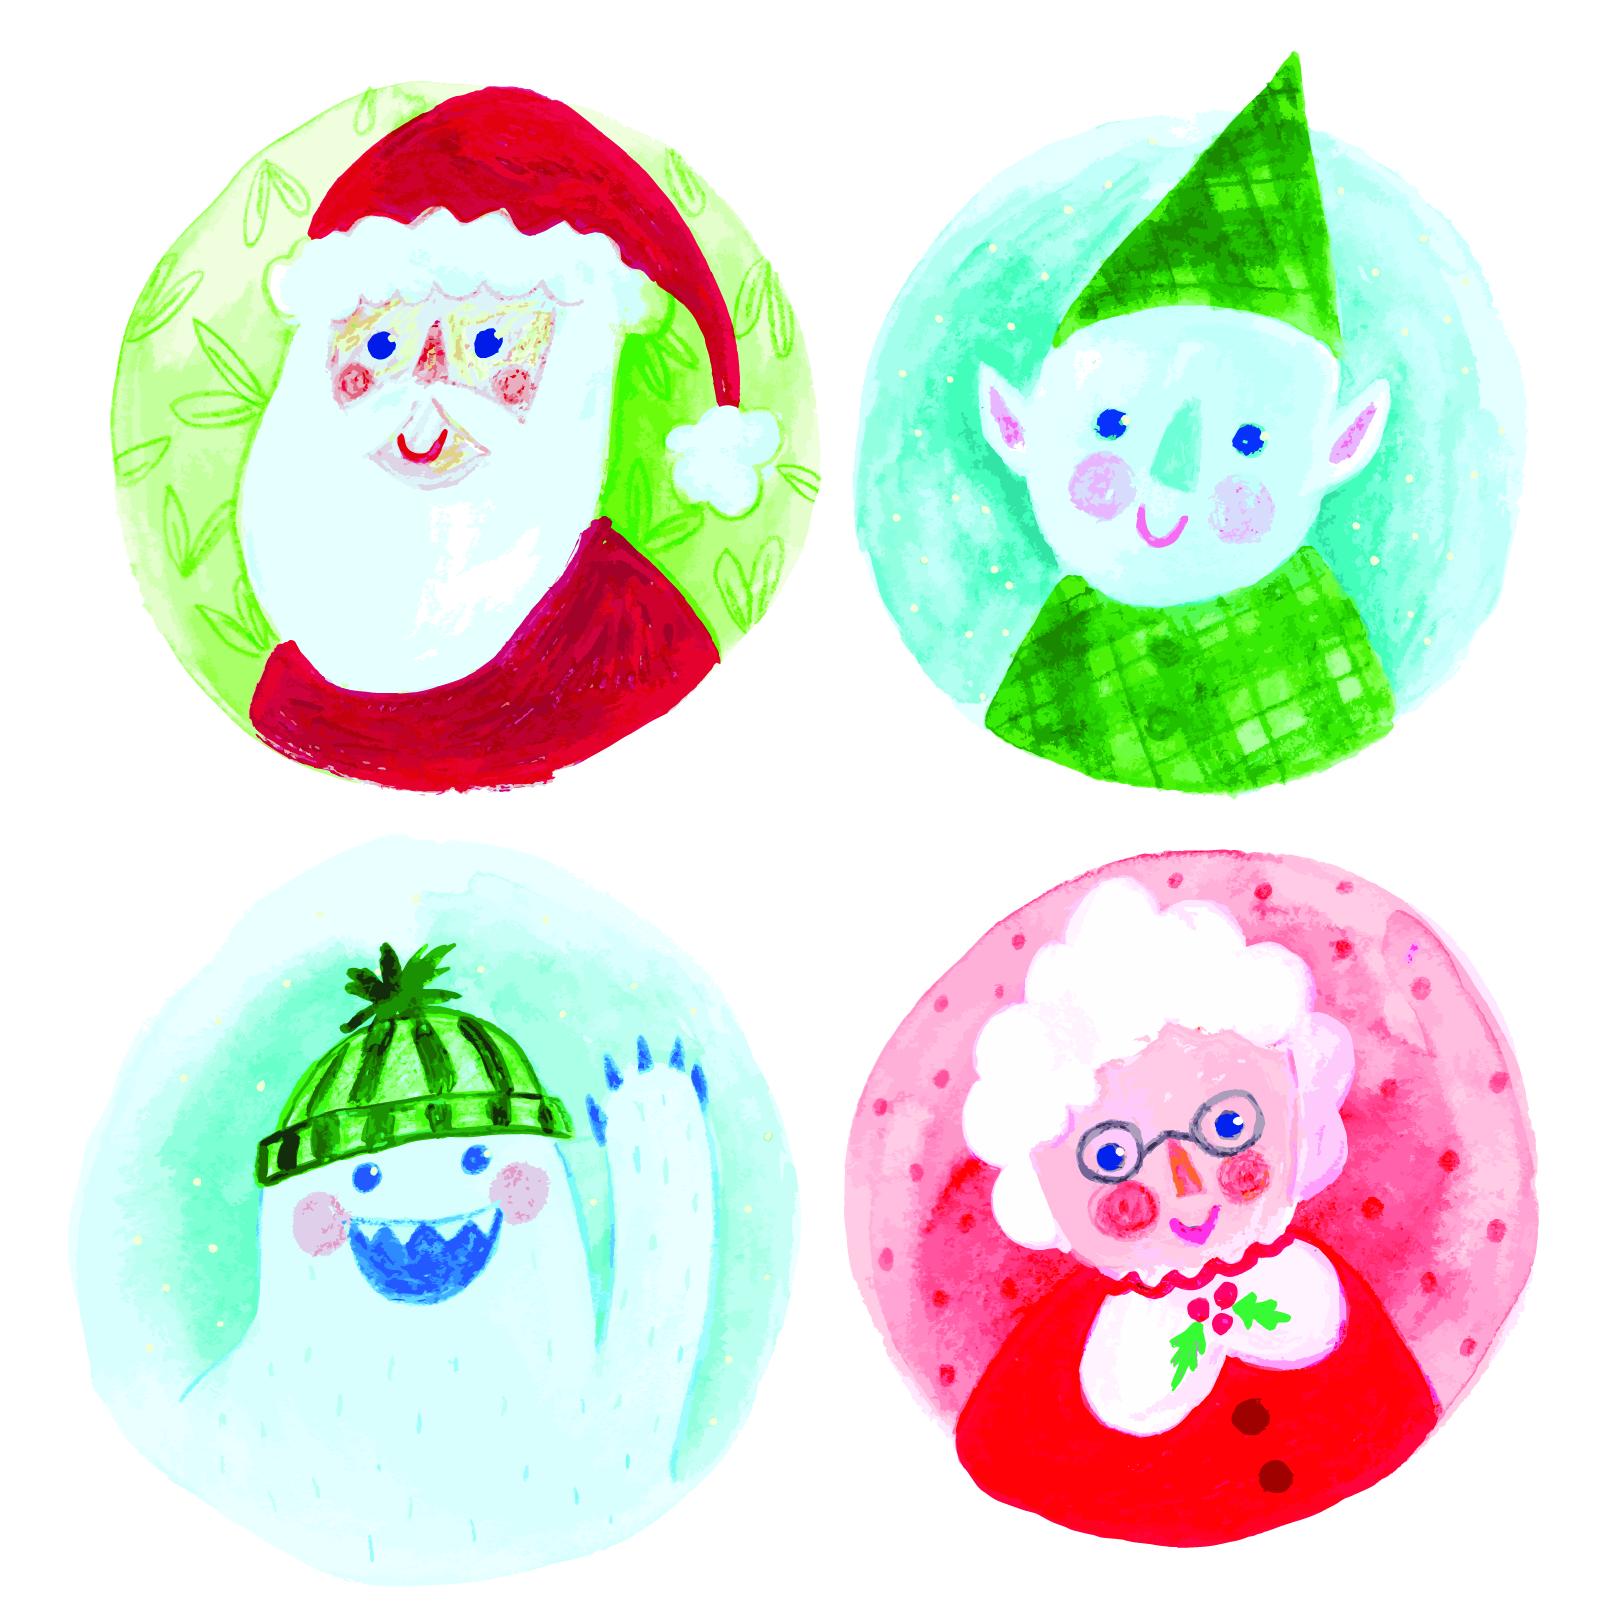 Hol18_ChristmasCharacters_Pattern-01.jpg